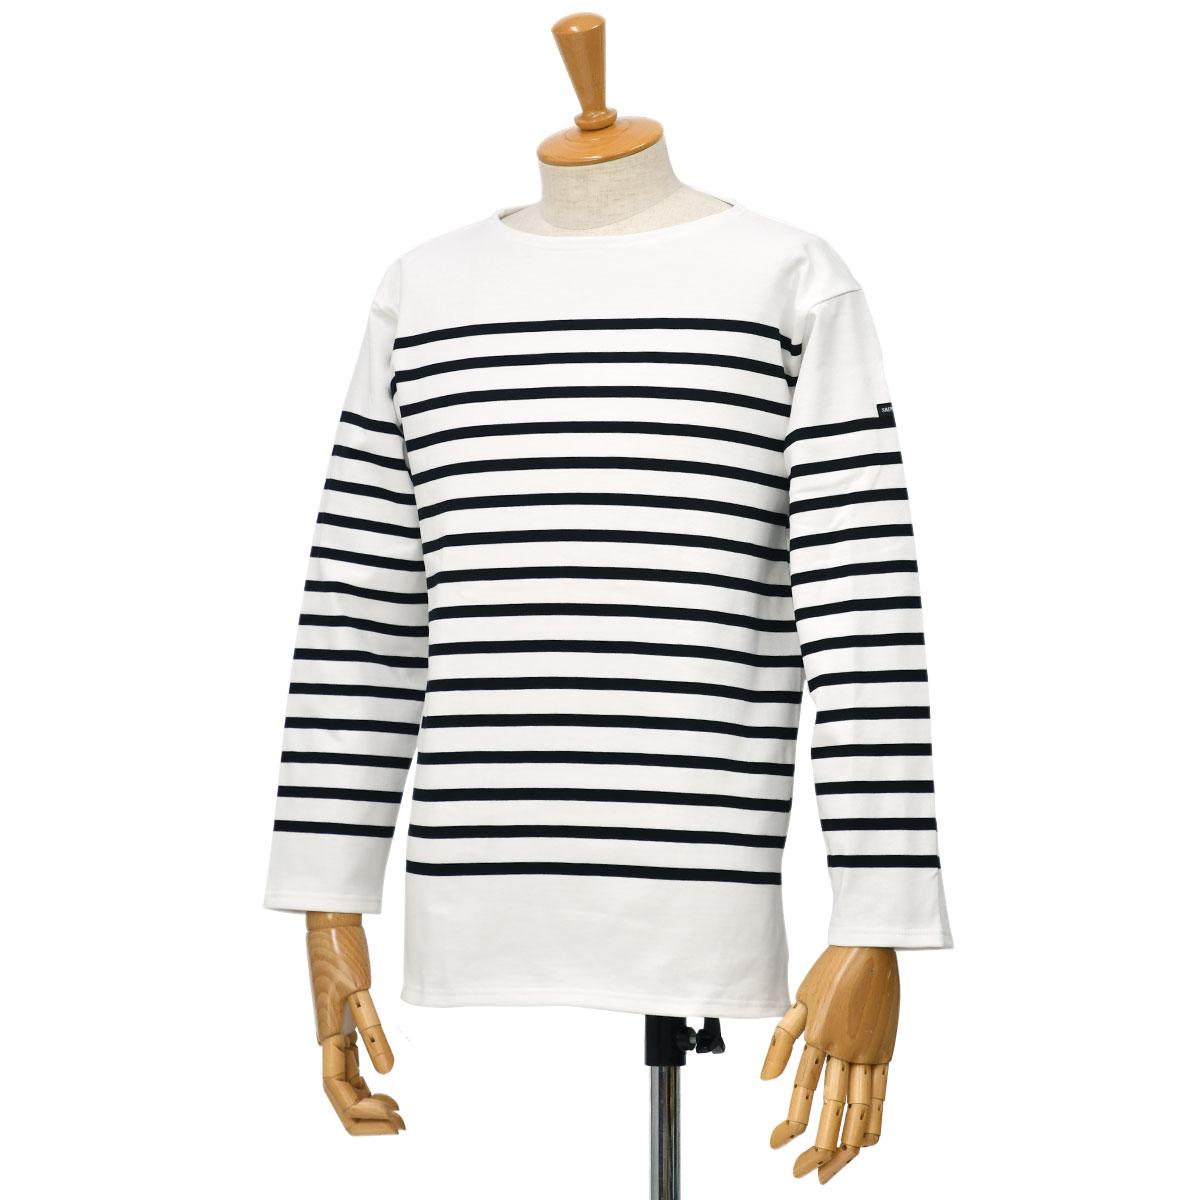 SAINT JAMES【セントジェームス】ボートネック七分袖バスクシャツ ナヴァル NAVAL NEIGE/NOIR(ホワイト/ブラック)